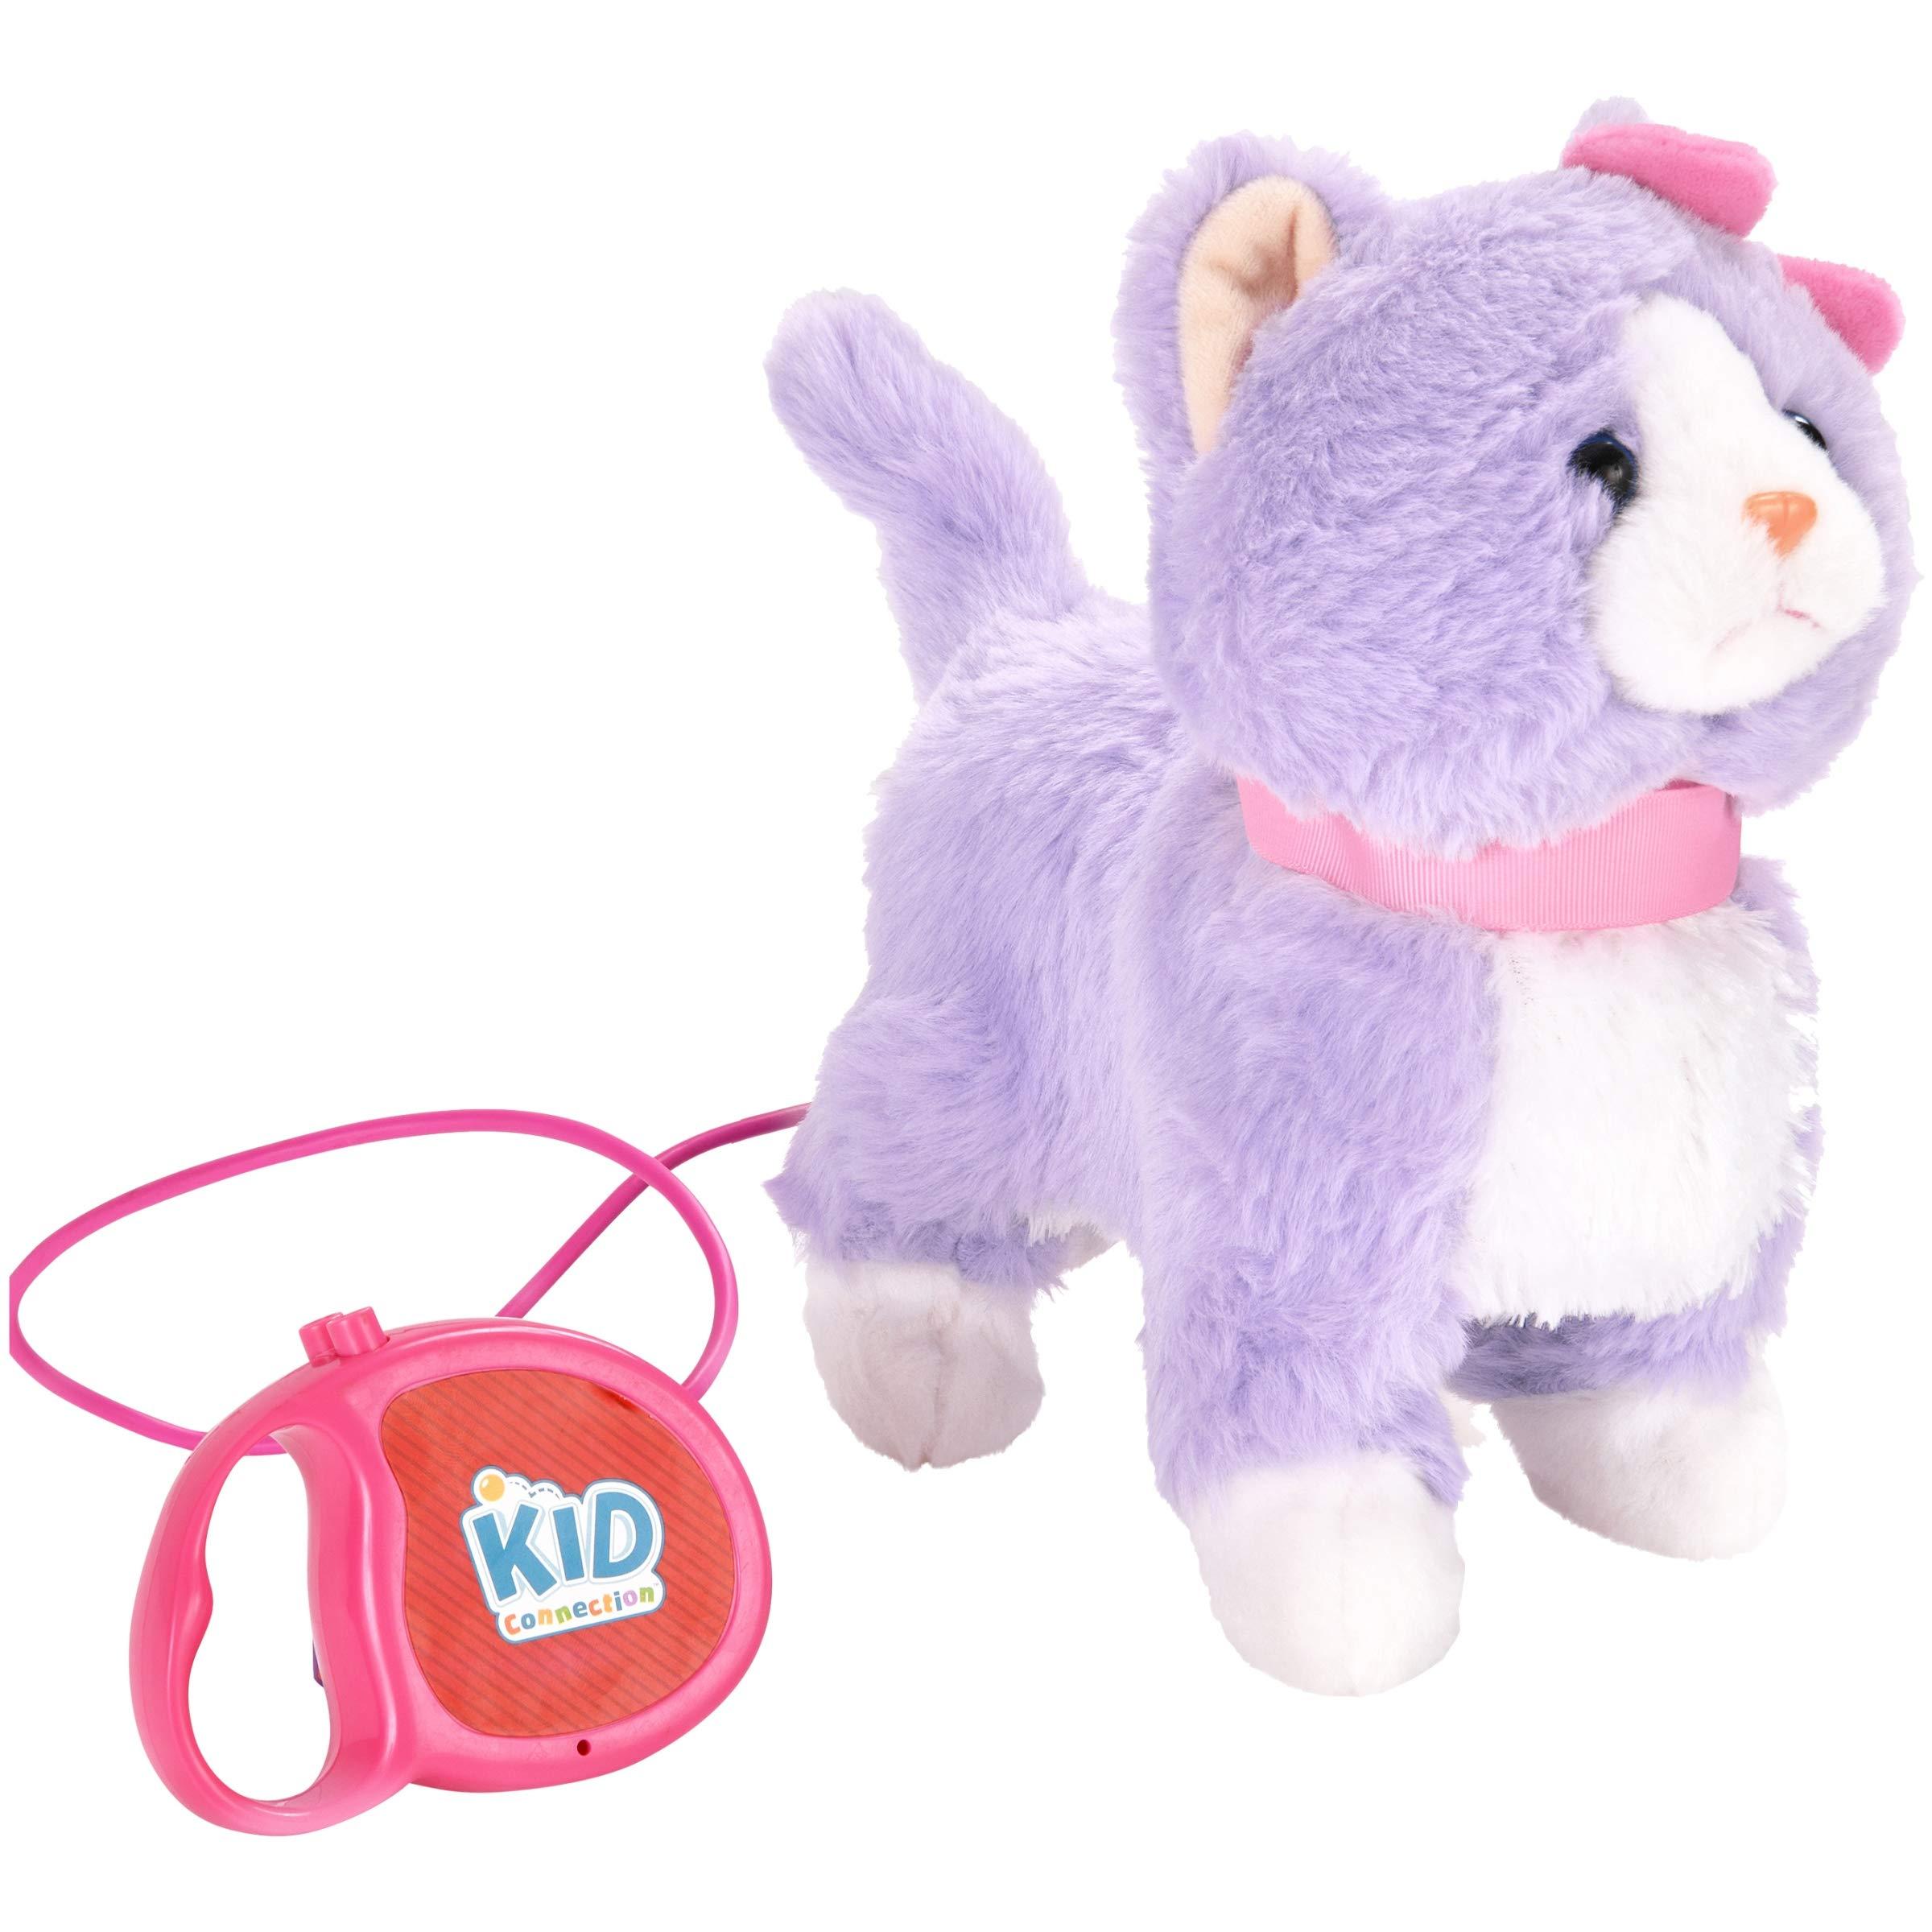 9'' Plush Cat Walking Pet, Purple & White with Pink Collar Remote Control Leash